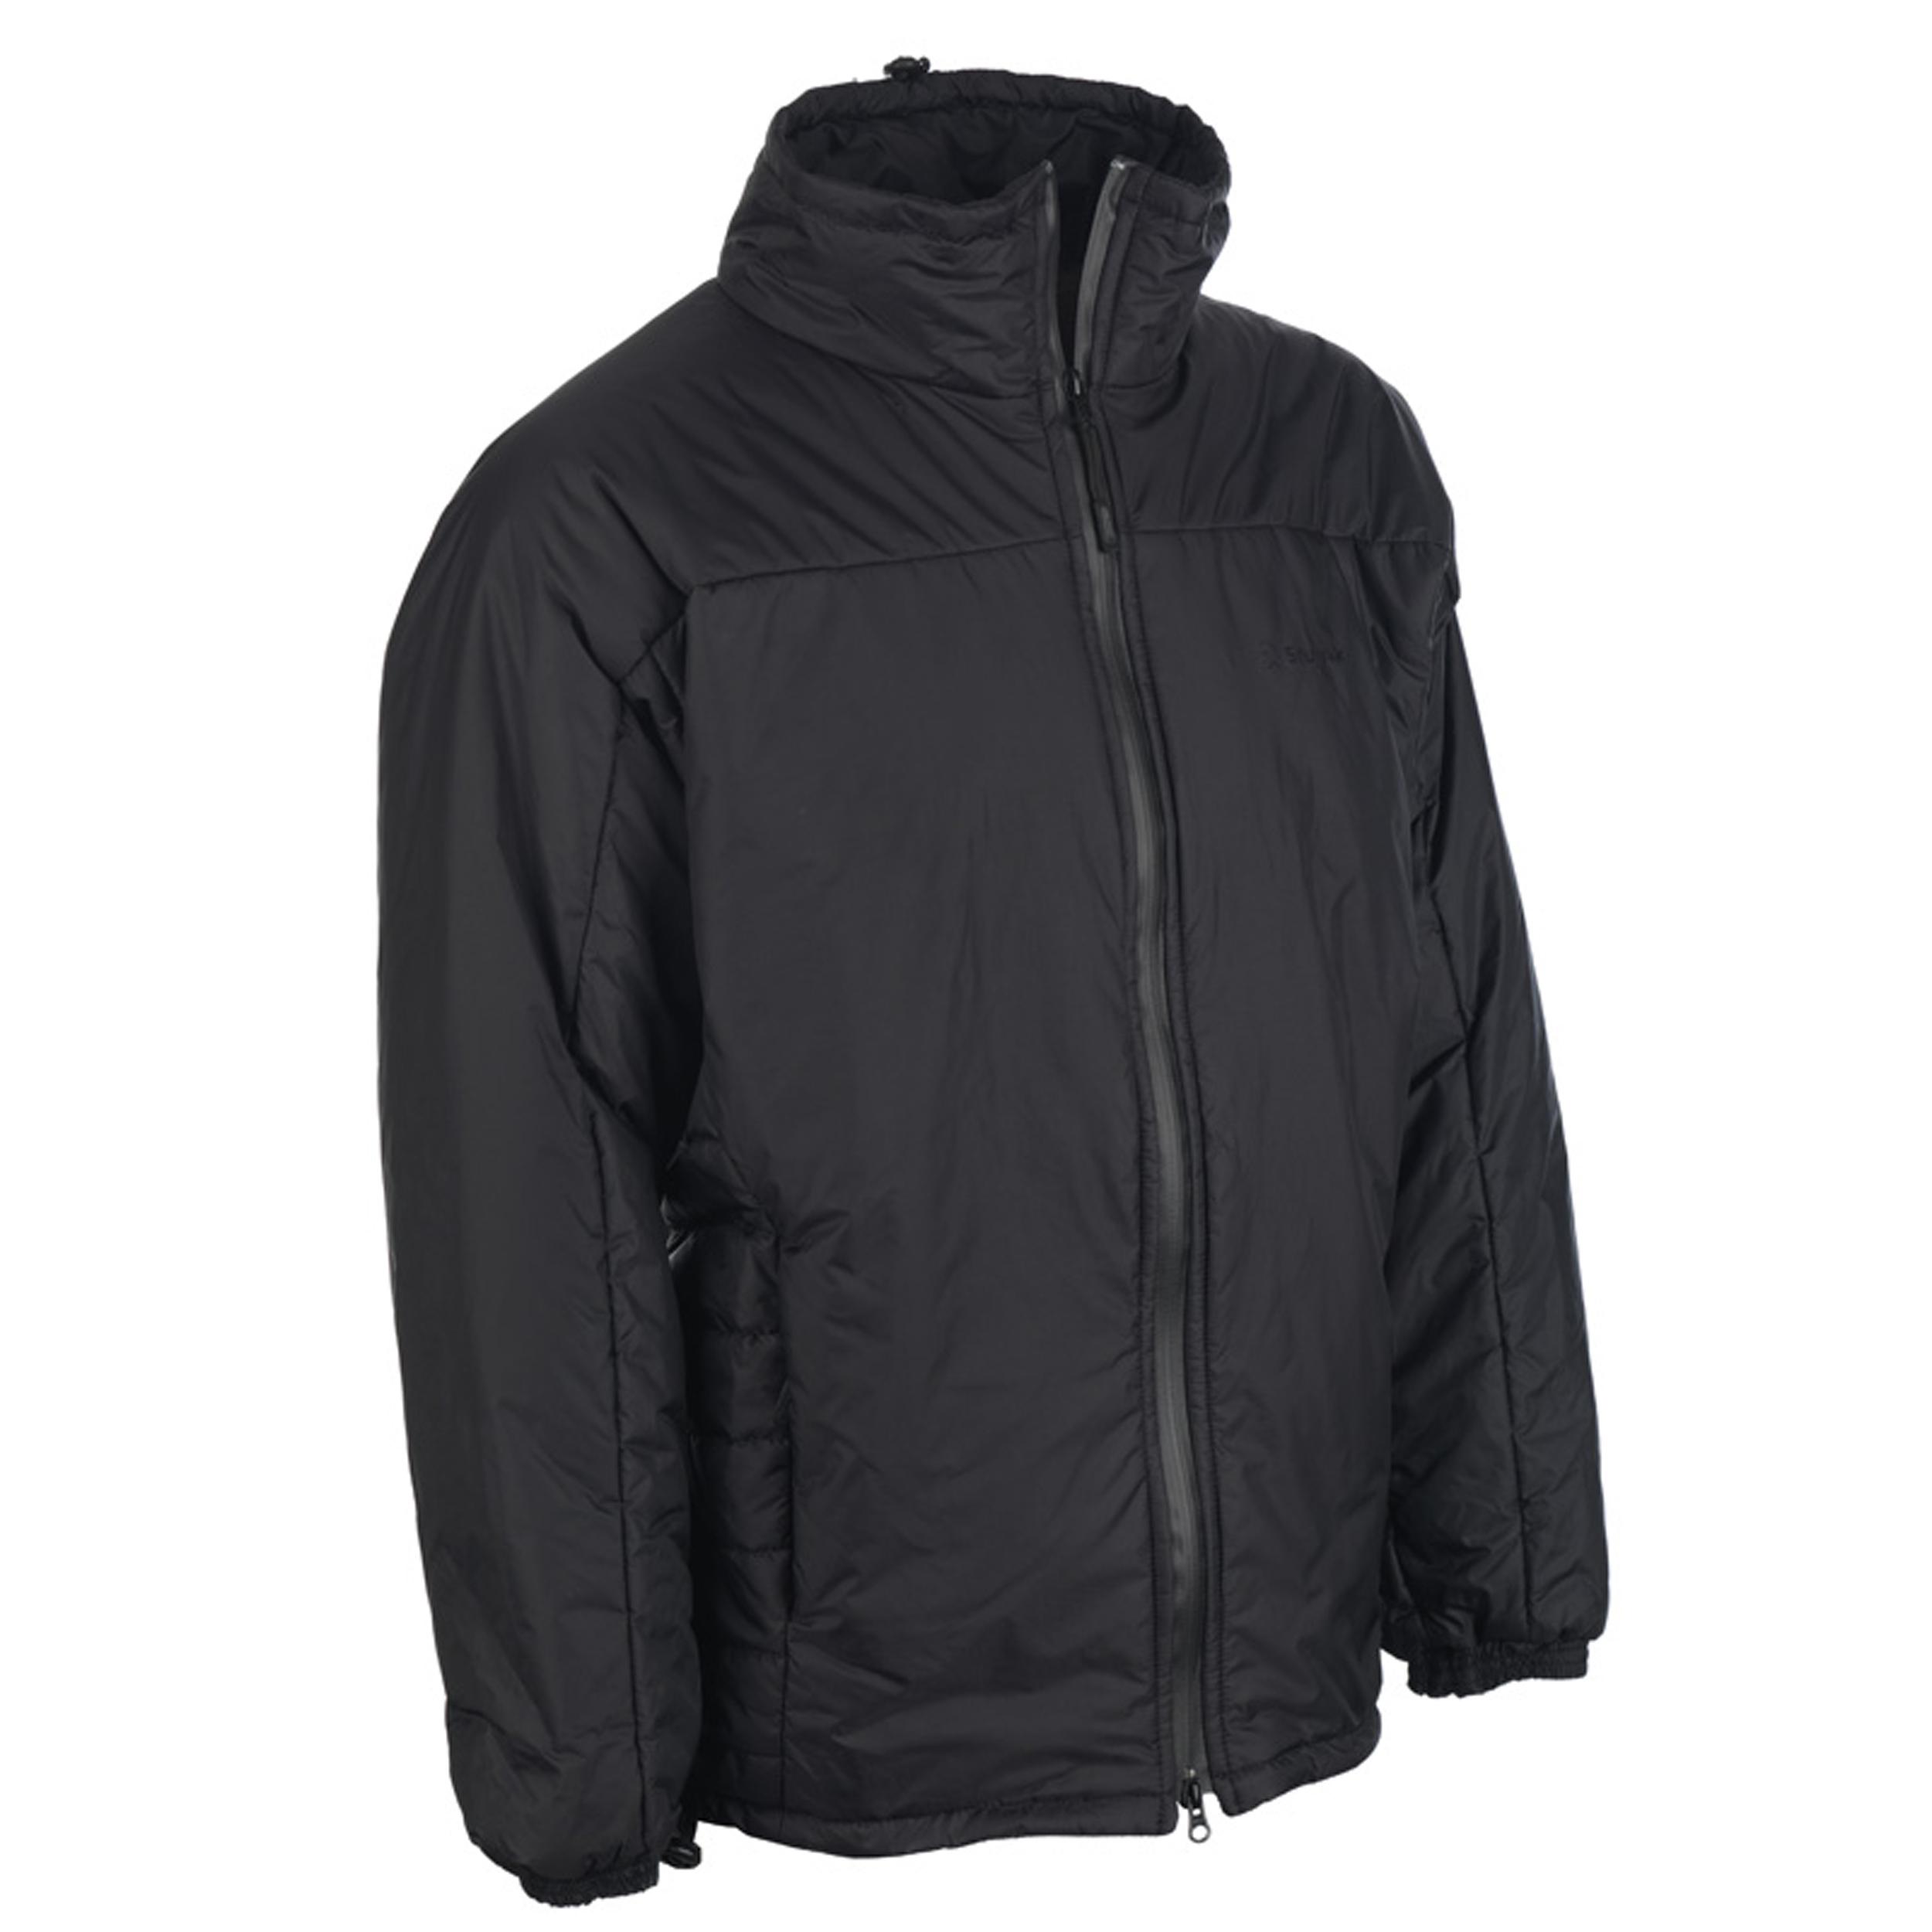 Snugpak Sj6 Jacket Black Sm